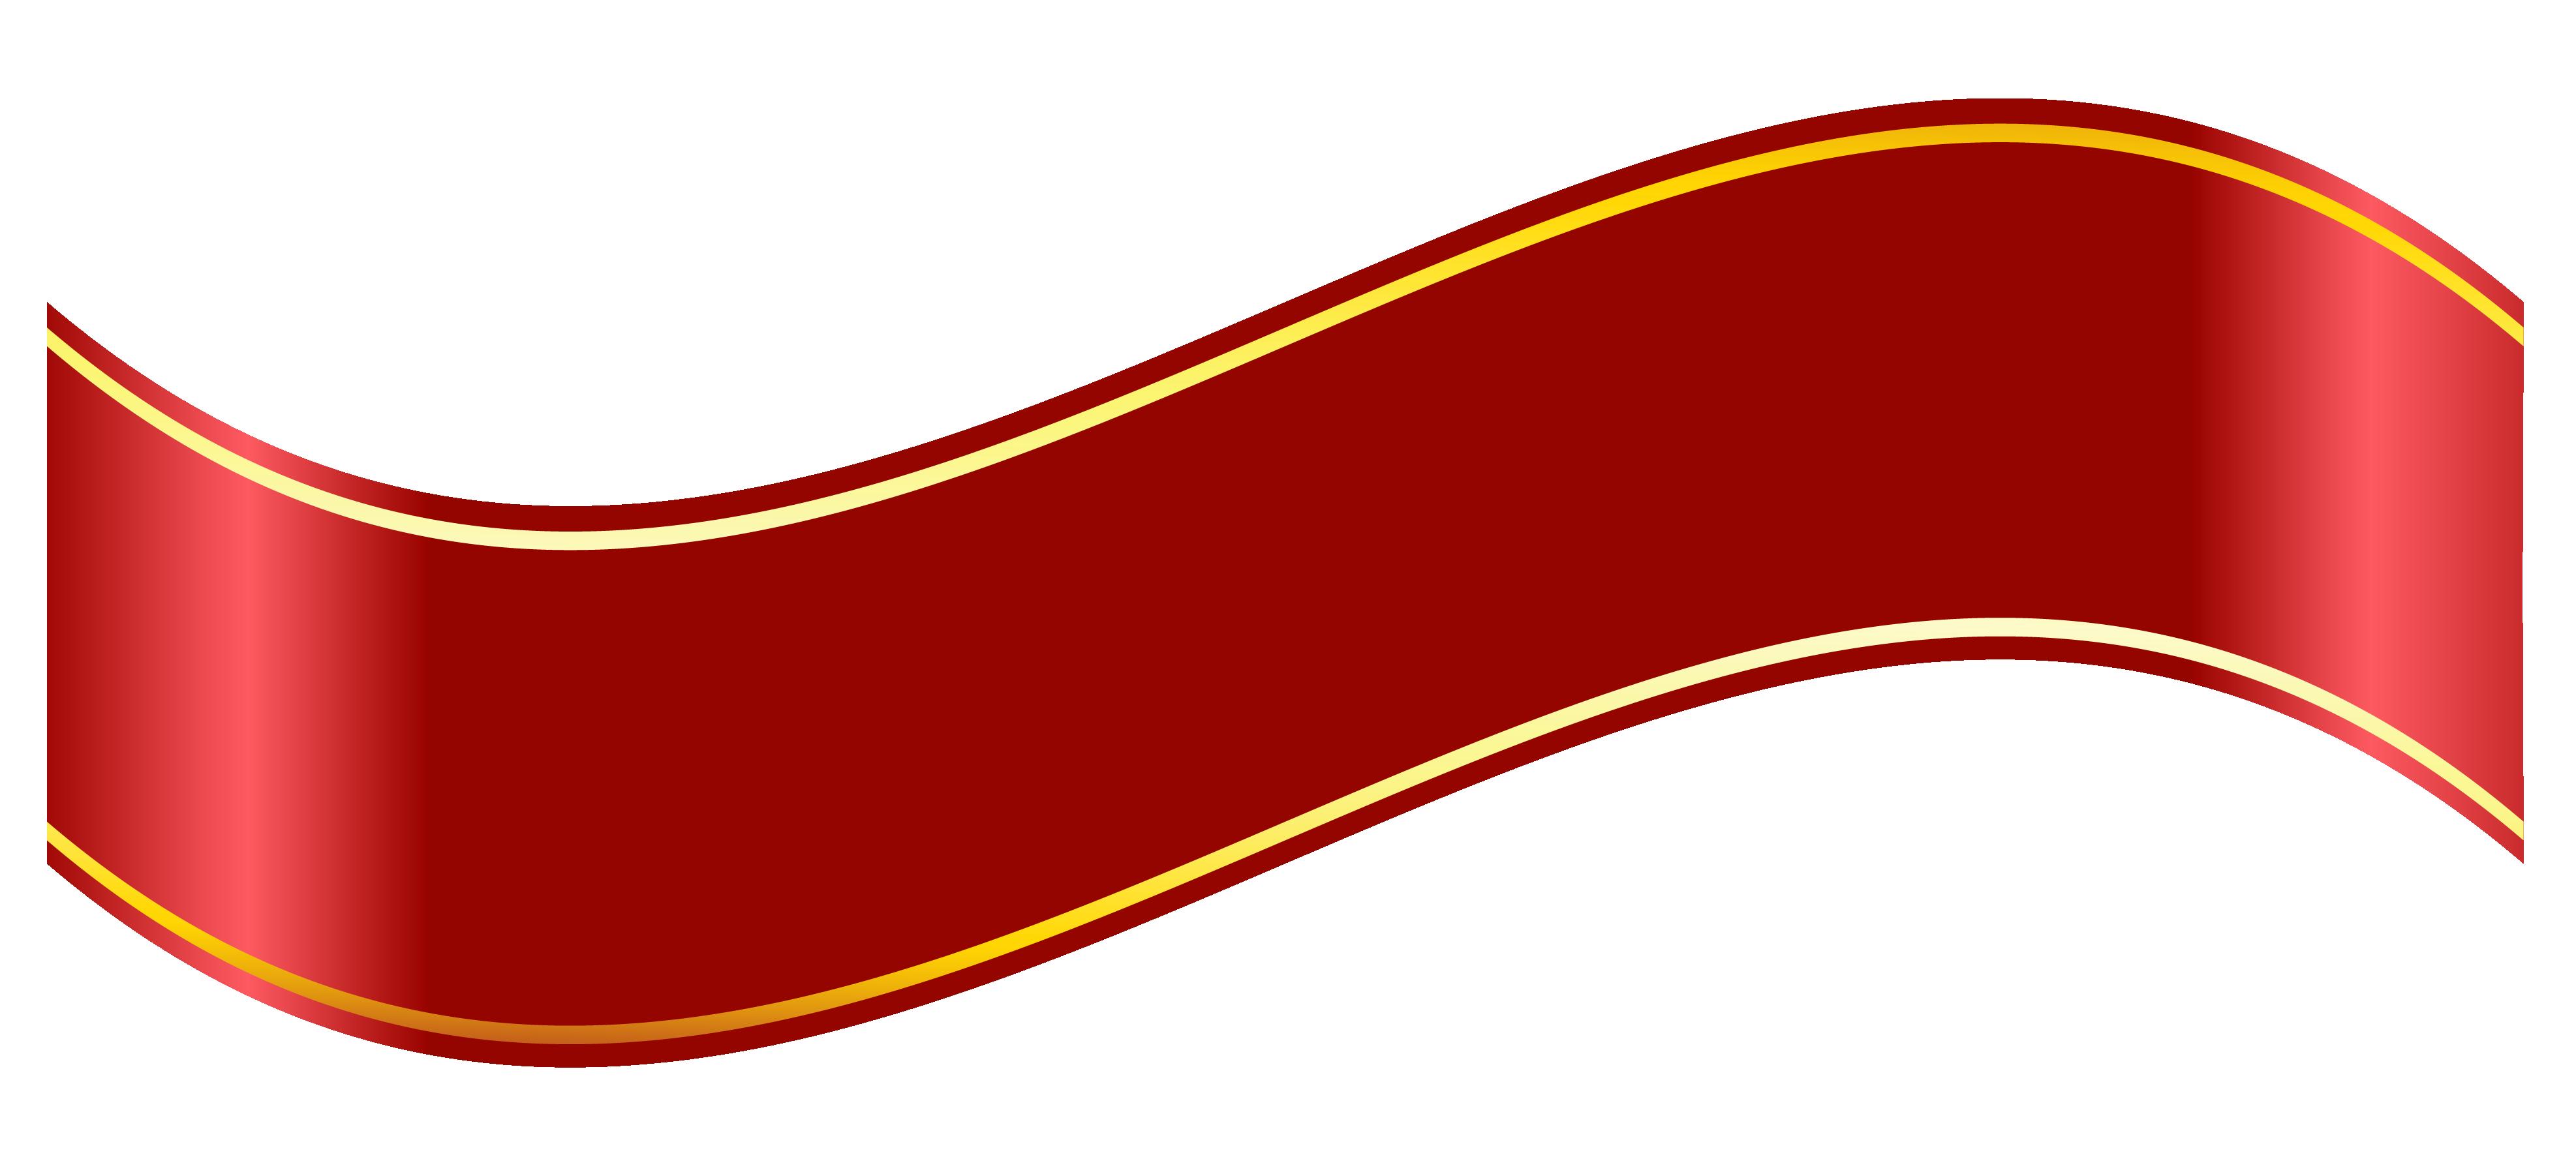 Elegance  clipart ribbon scroll Clipart Scroll Banner cliparts Scroll